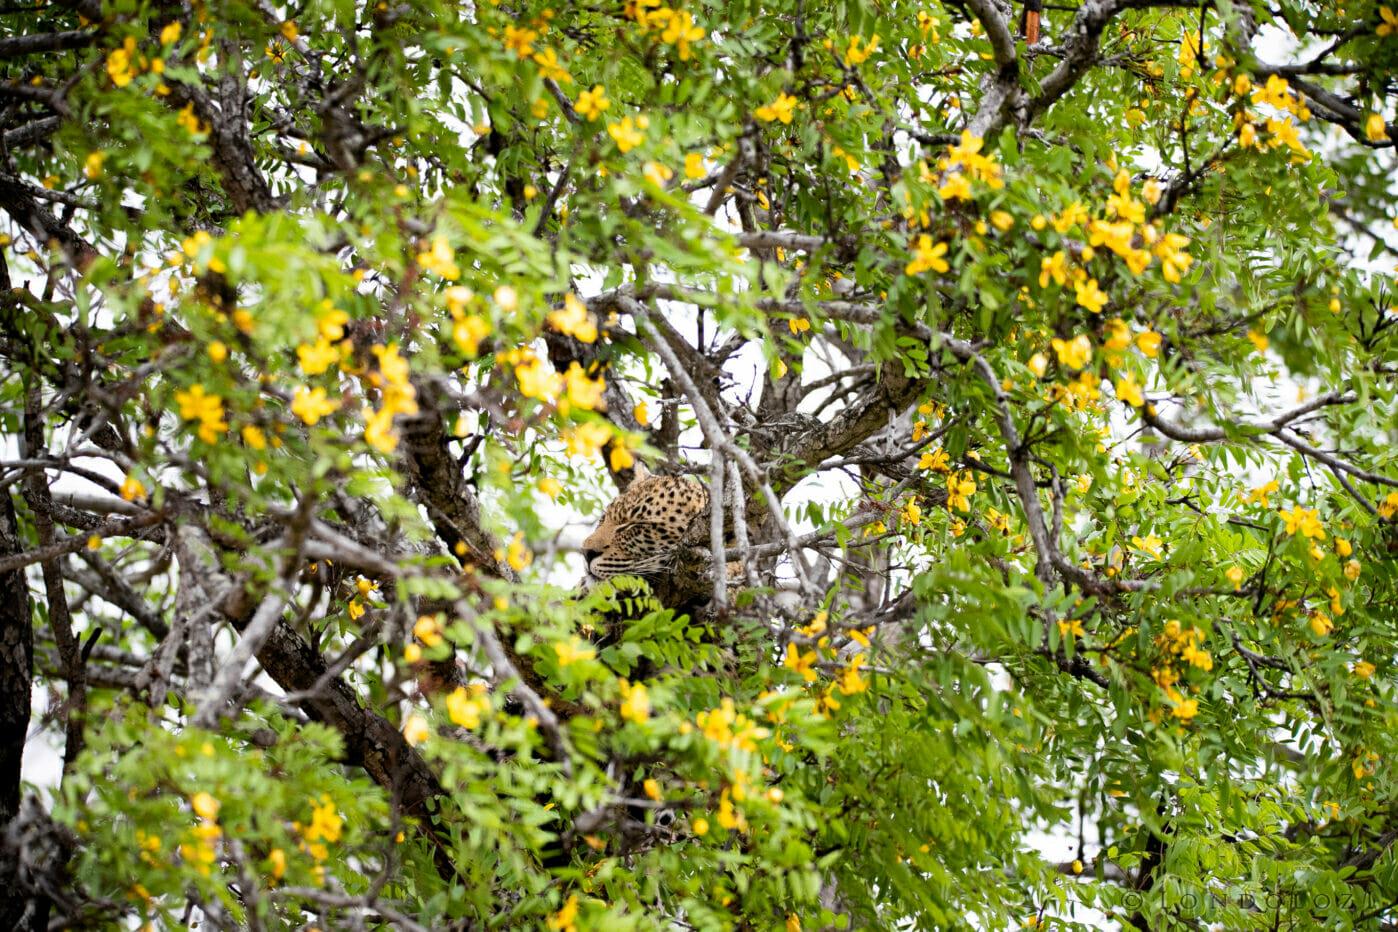 Sdz Nkoveni Female Leopard's Cub In Wattle Flowers Wider